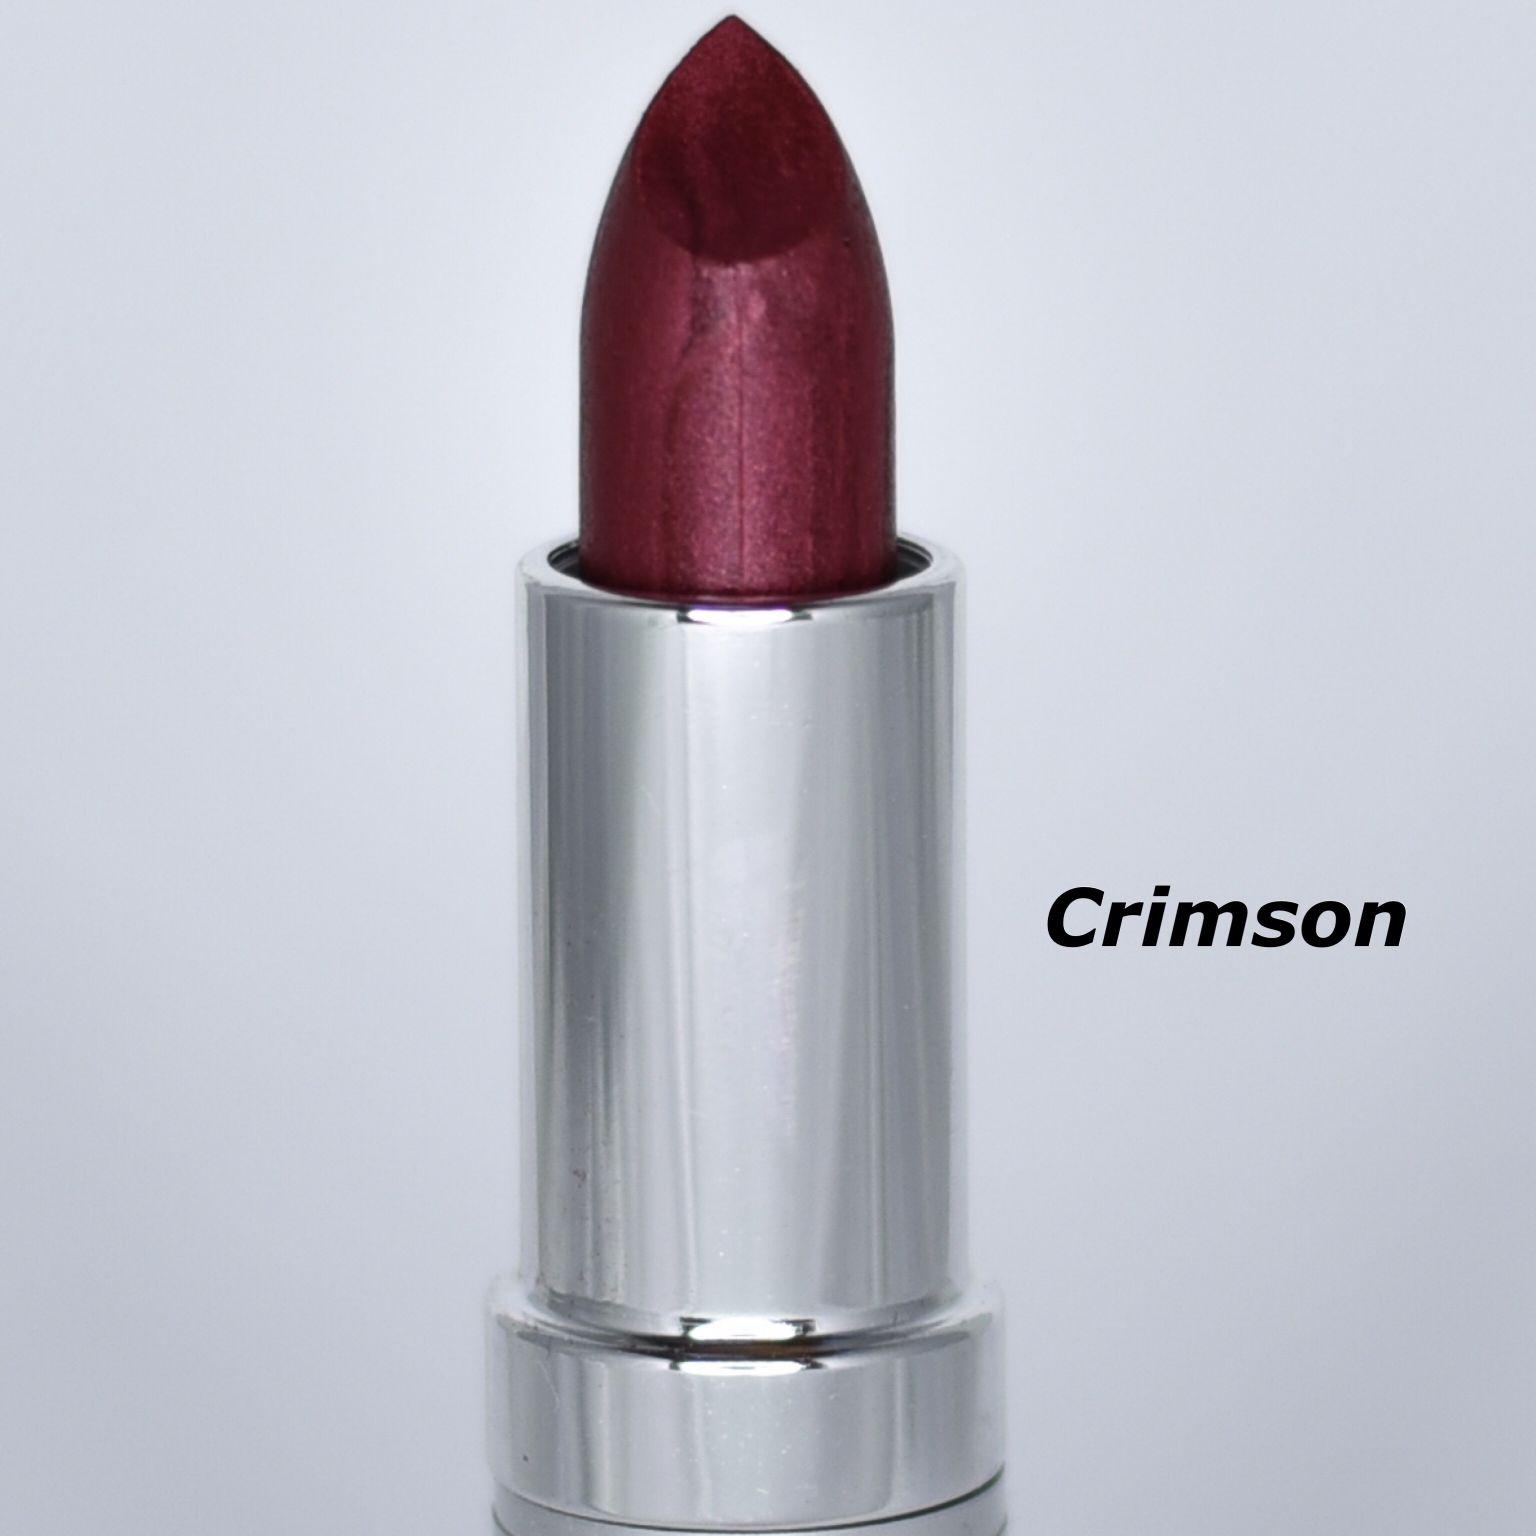 Crimson Lipstick